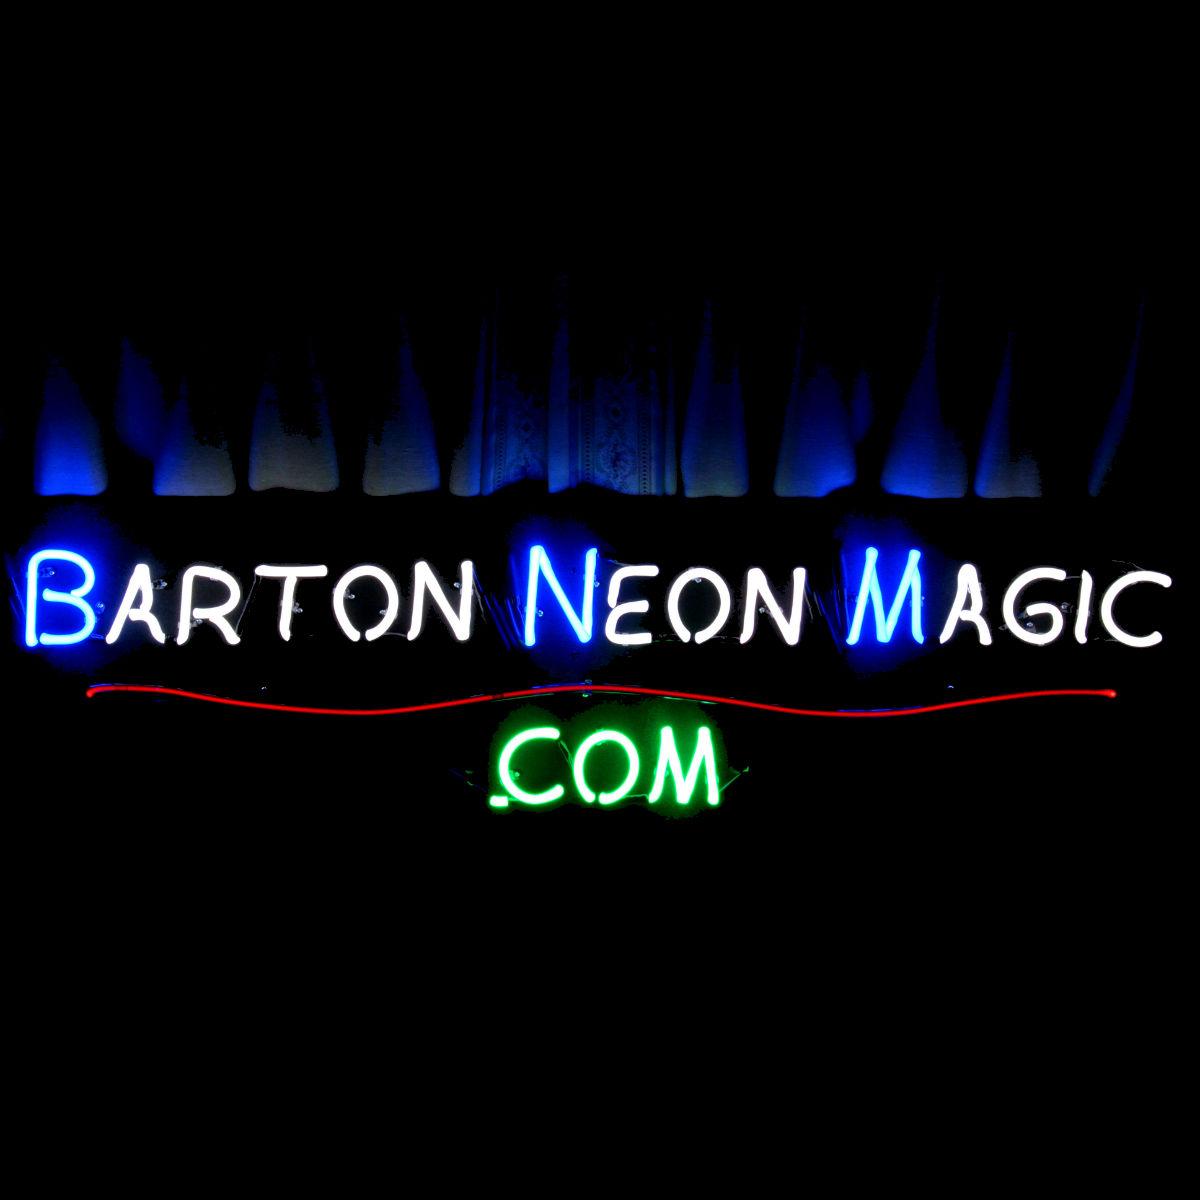 BartonNeonMagic.com - Fine Art Gallery Quality Designer Neon Light Sculptures by John Barton - International Neon Glass Artist